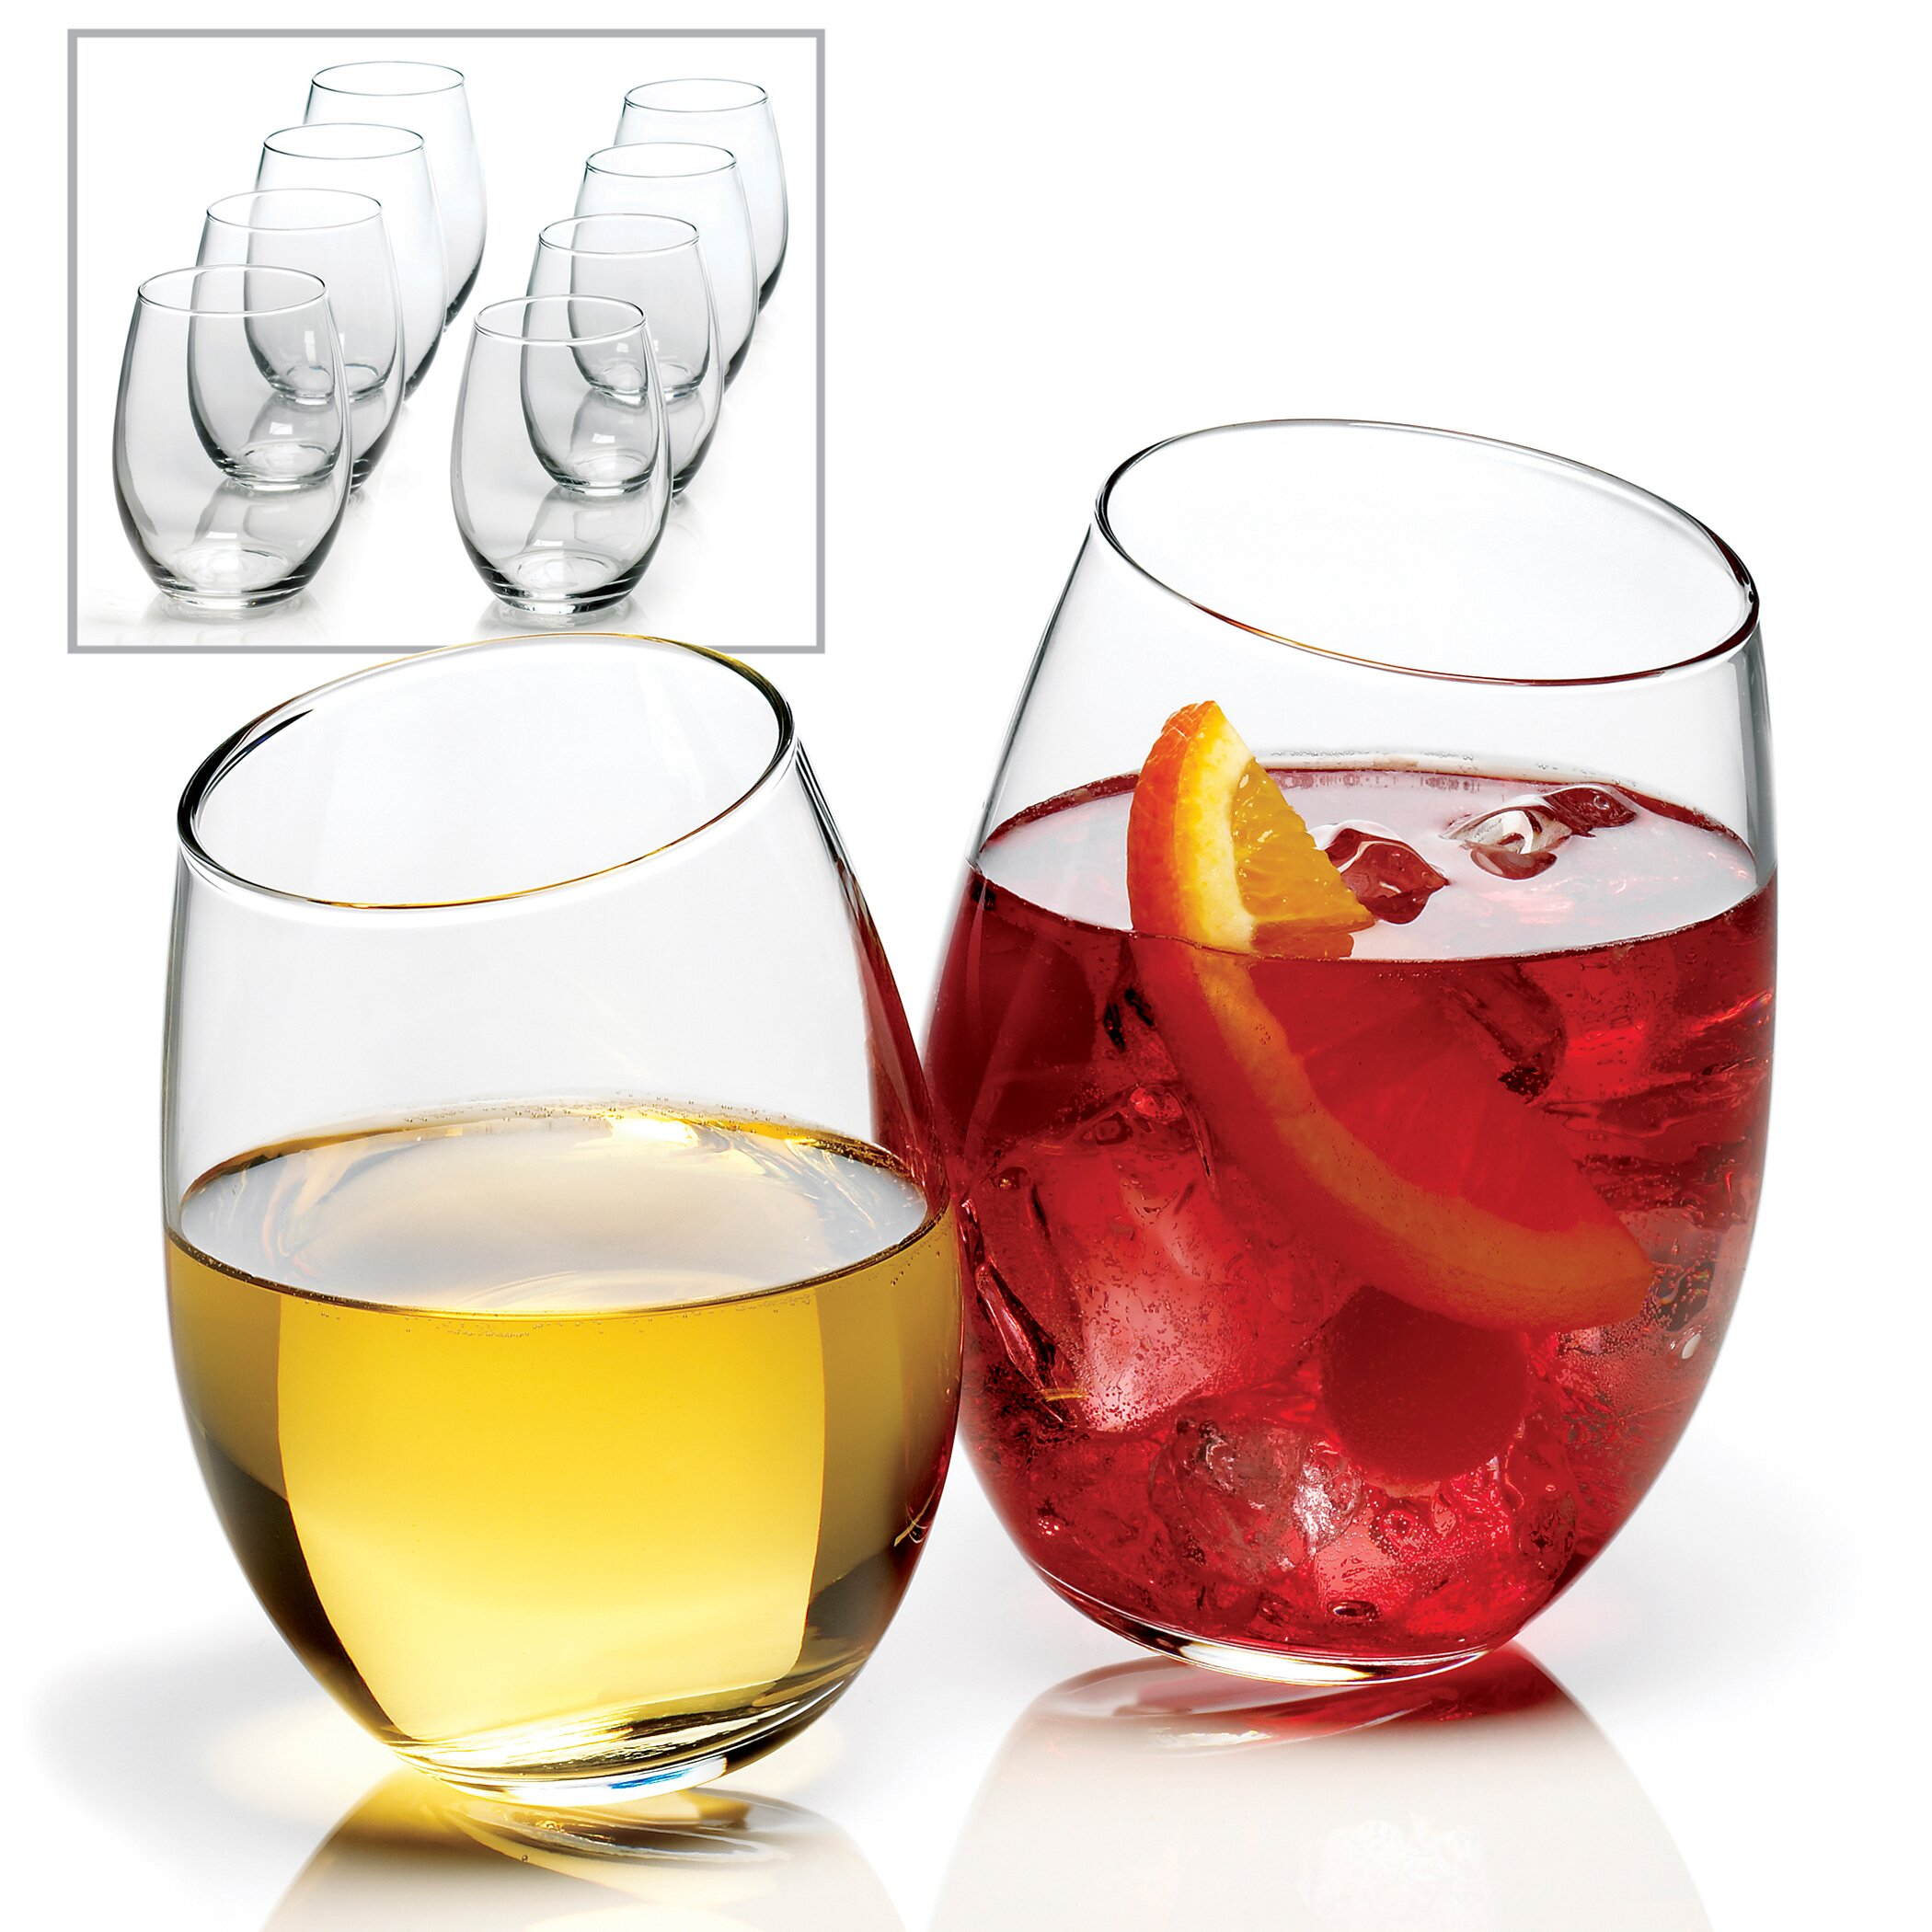 Anchor hocking 15 oz stemless wine glass reviews wayfair - Stemless wine goblets ...